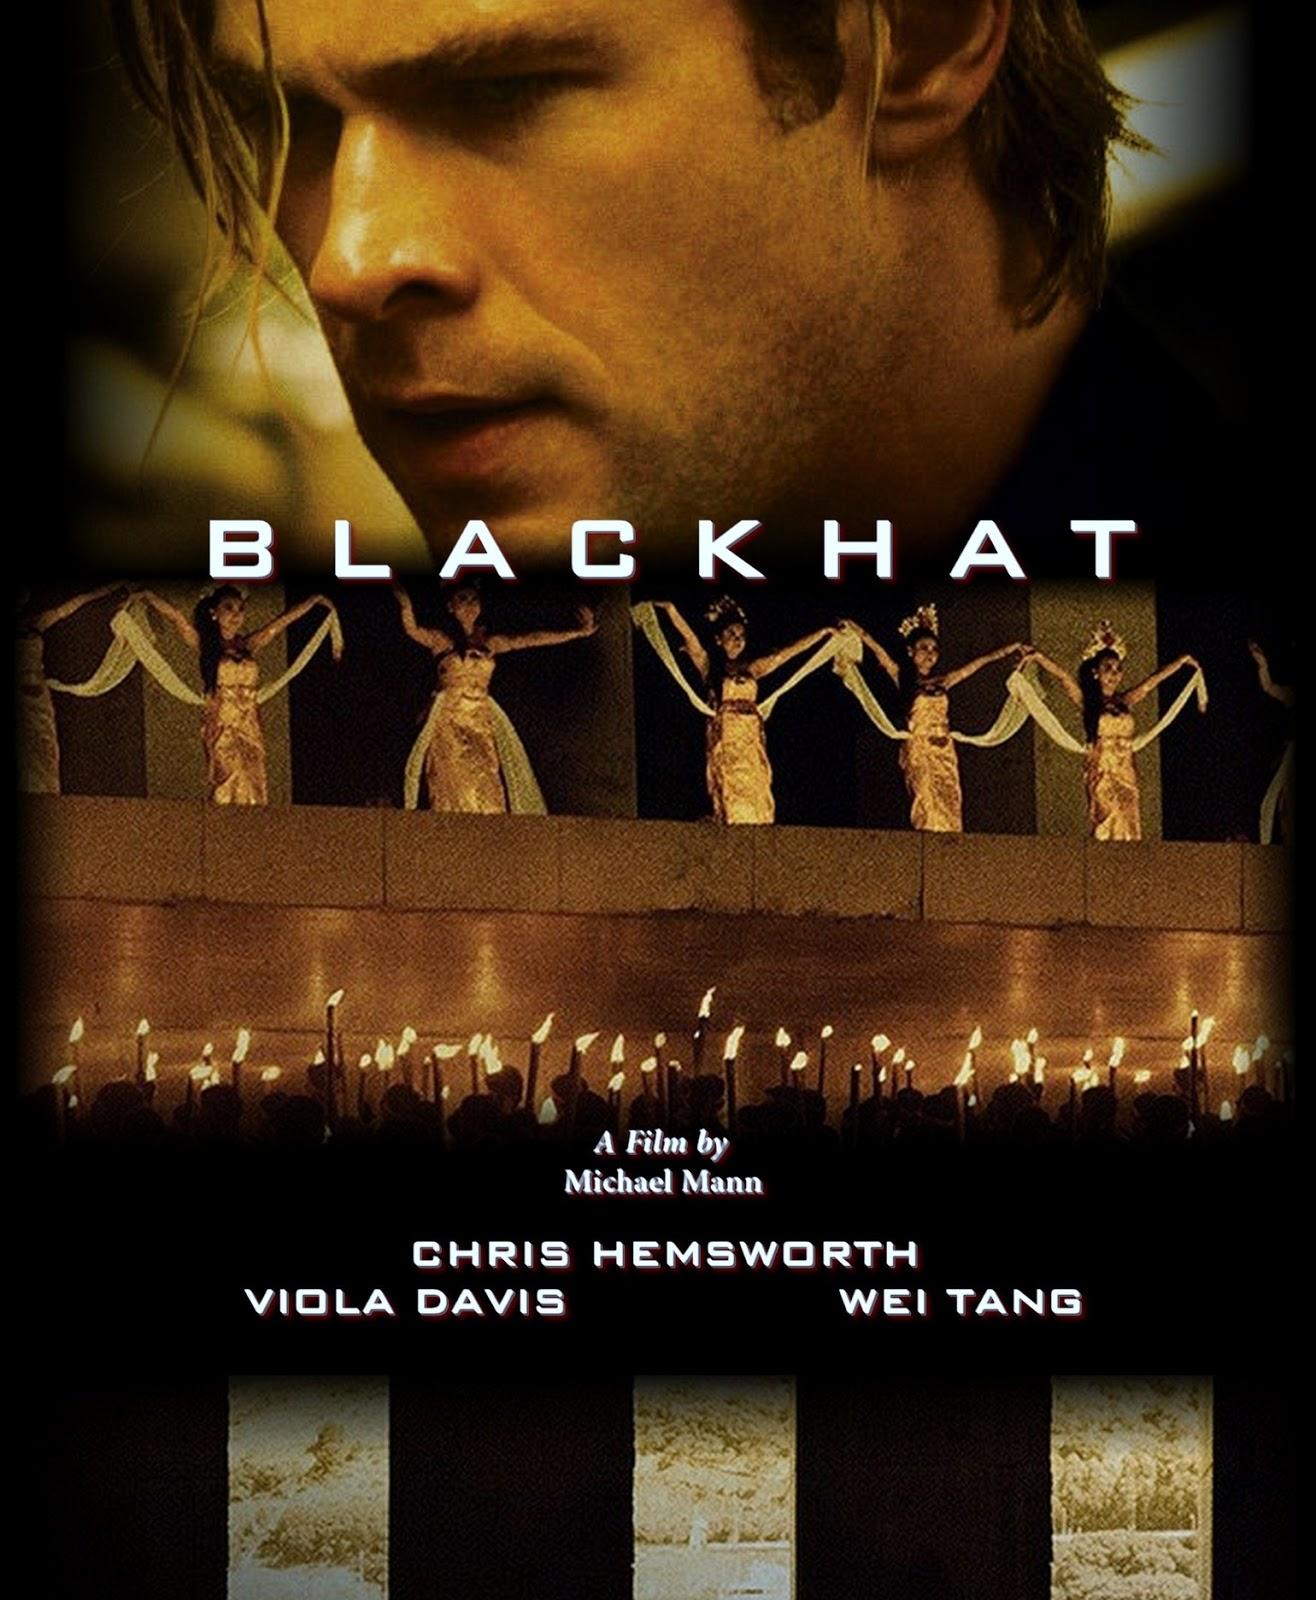 free download film blackhat 2015 sub indonesia bluray